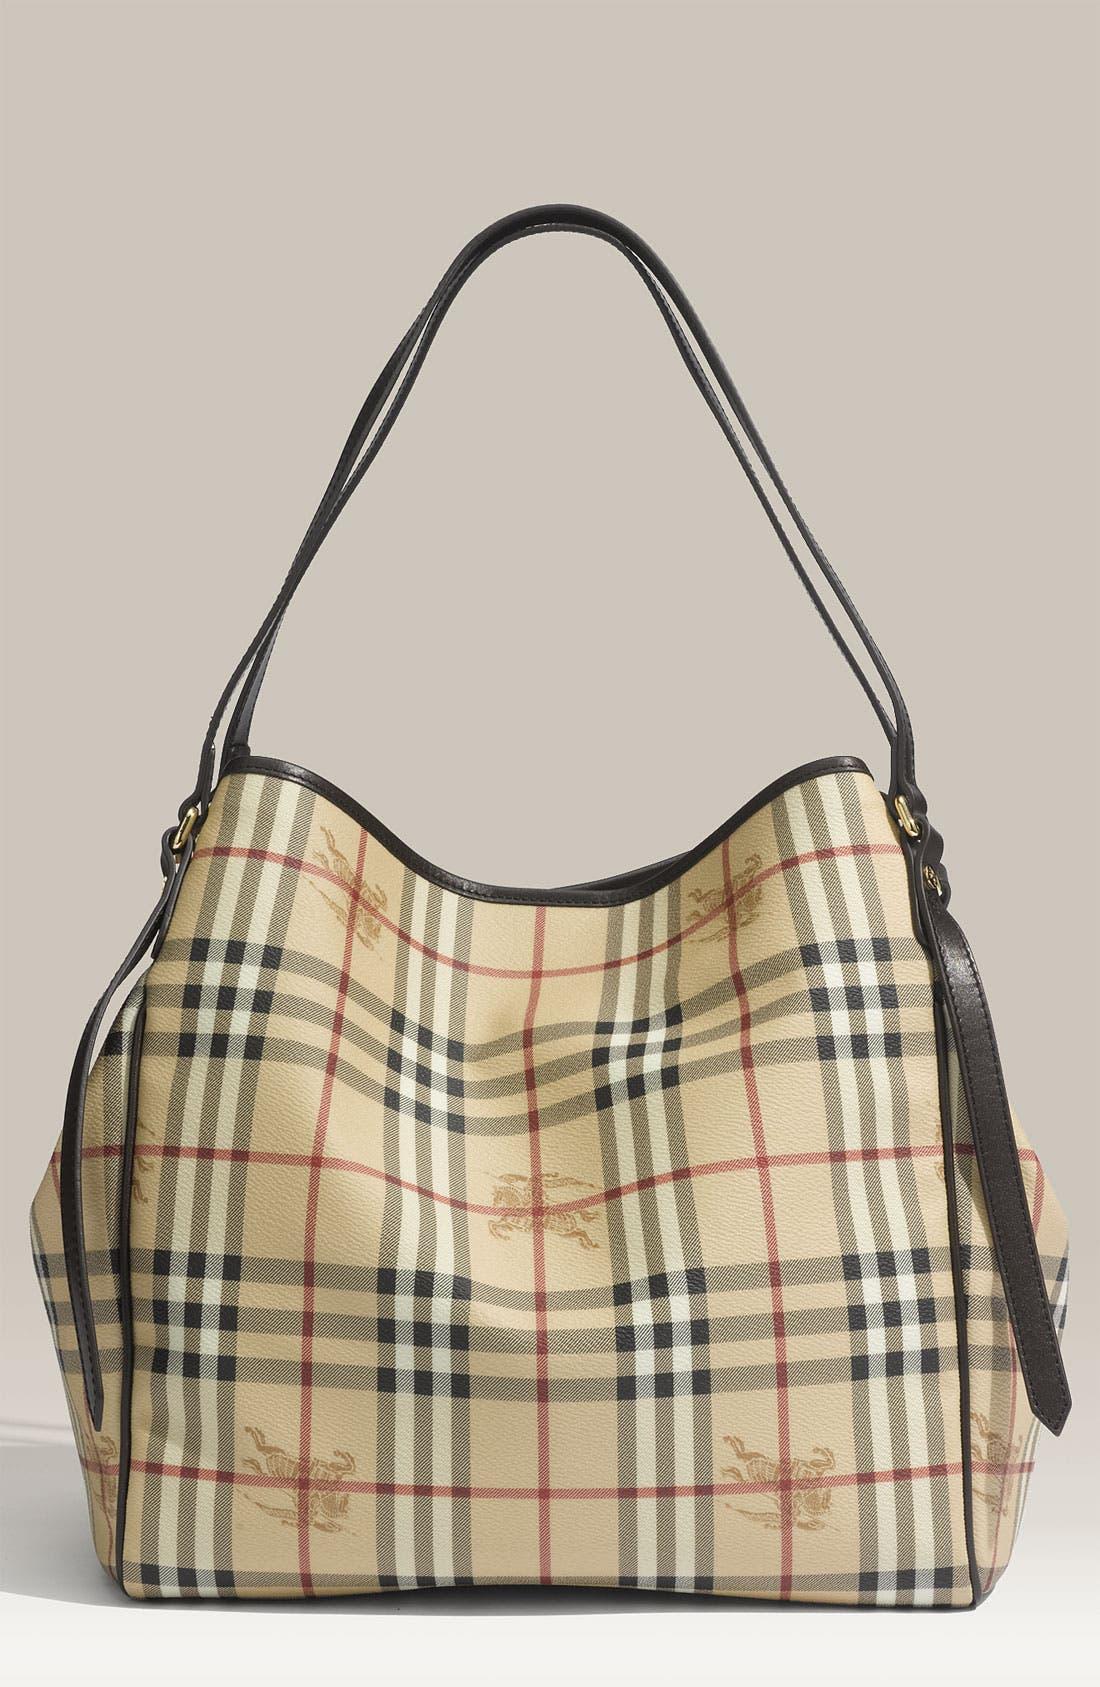 Main Image - Burberry 'Medium Haymarket Check' Shoulder Bag